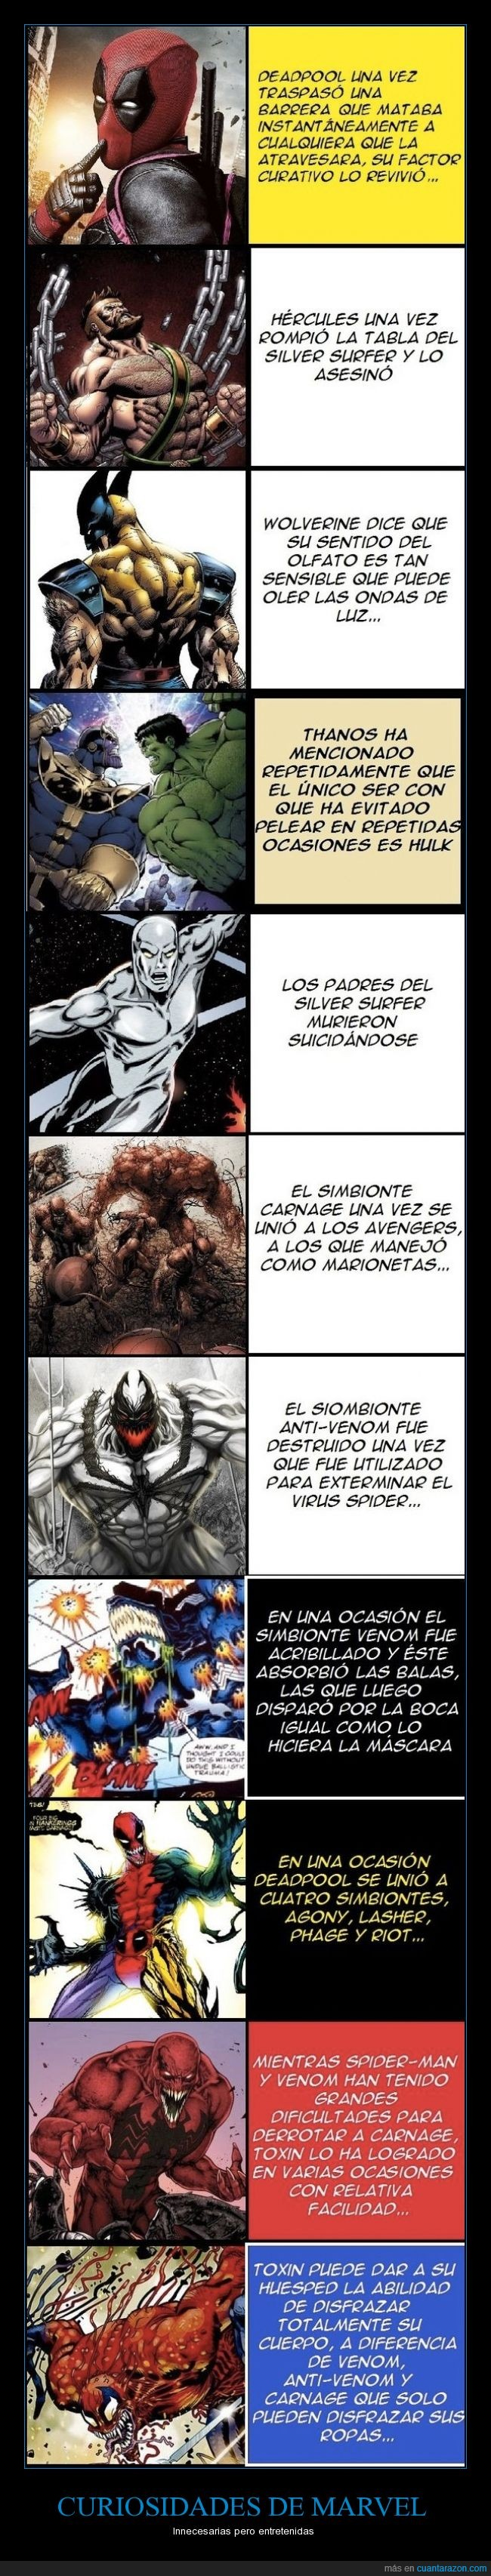 curiosidades,marvel,spiderman,venom,wolverine